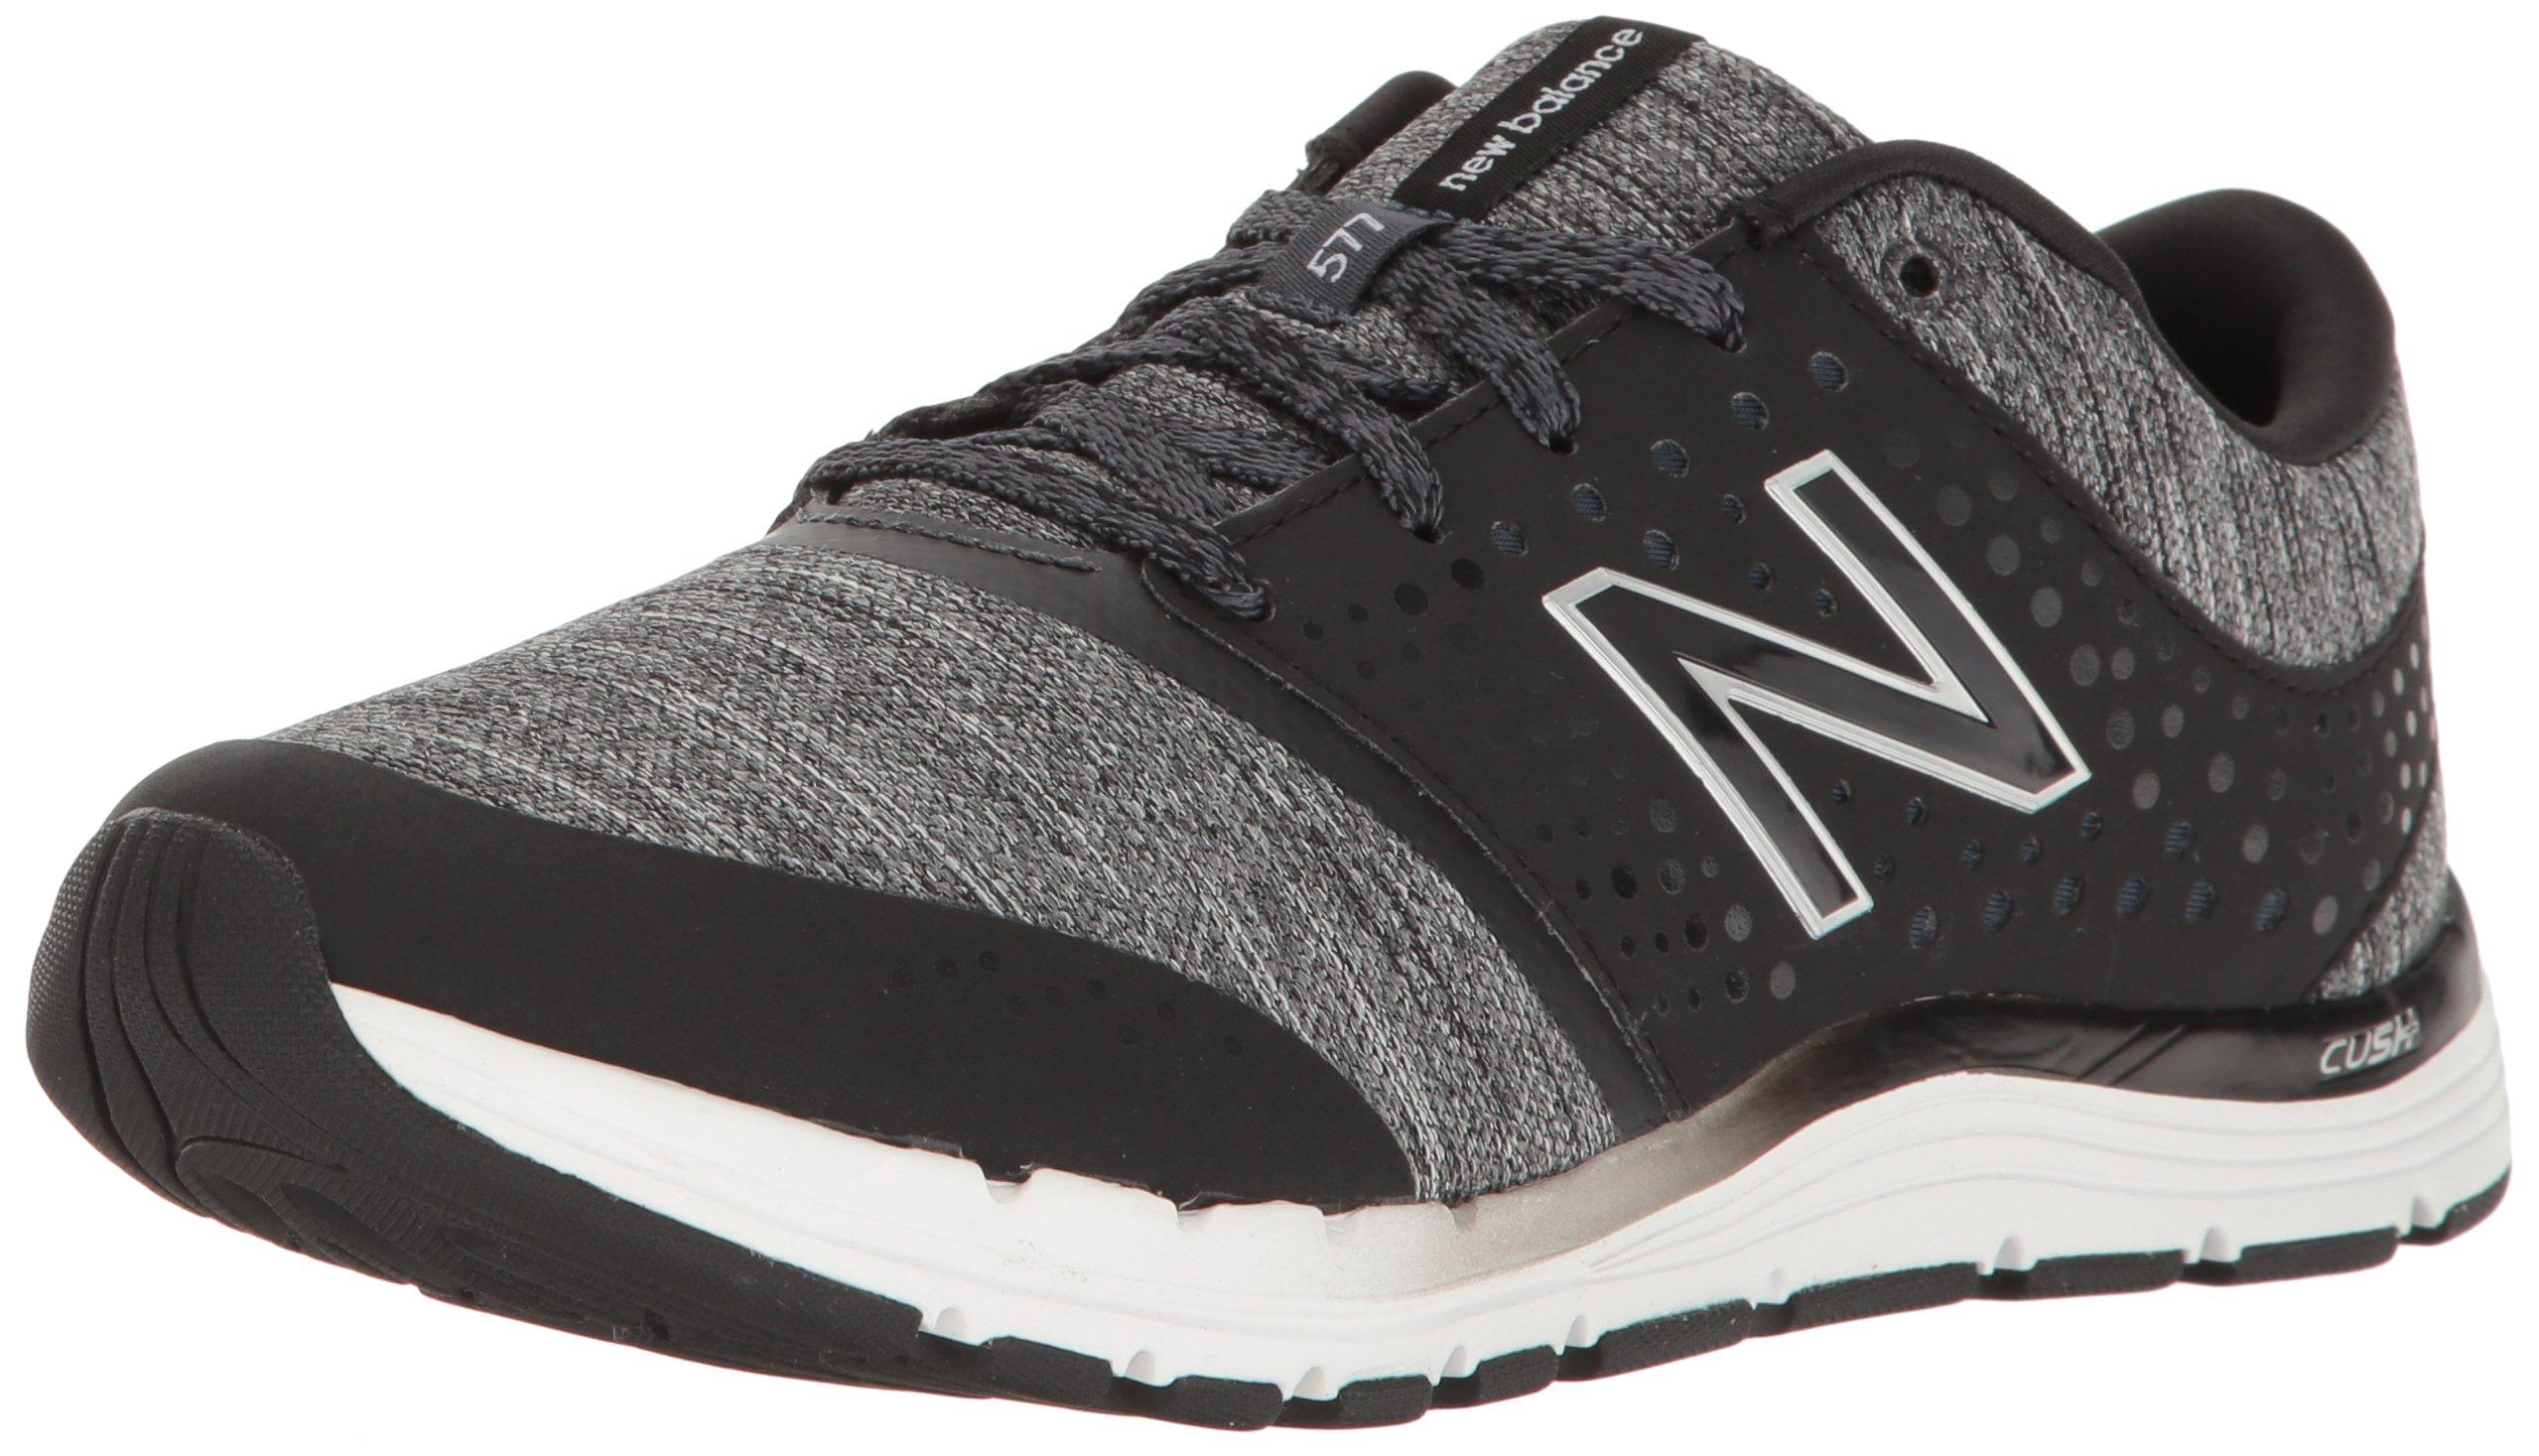 New Balance Women's WX577V4 CUSH + Training Shoe,Black/Heather, 7.5 B US by New Balance